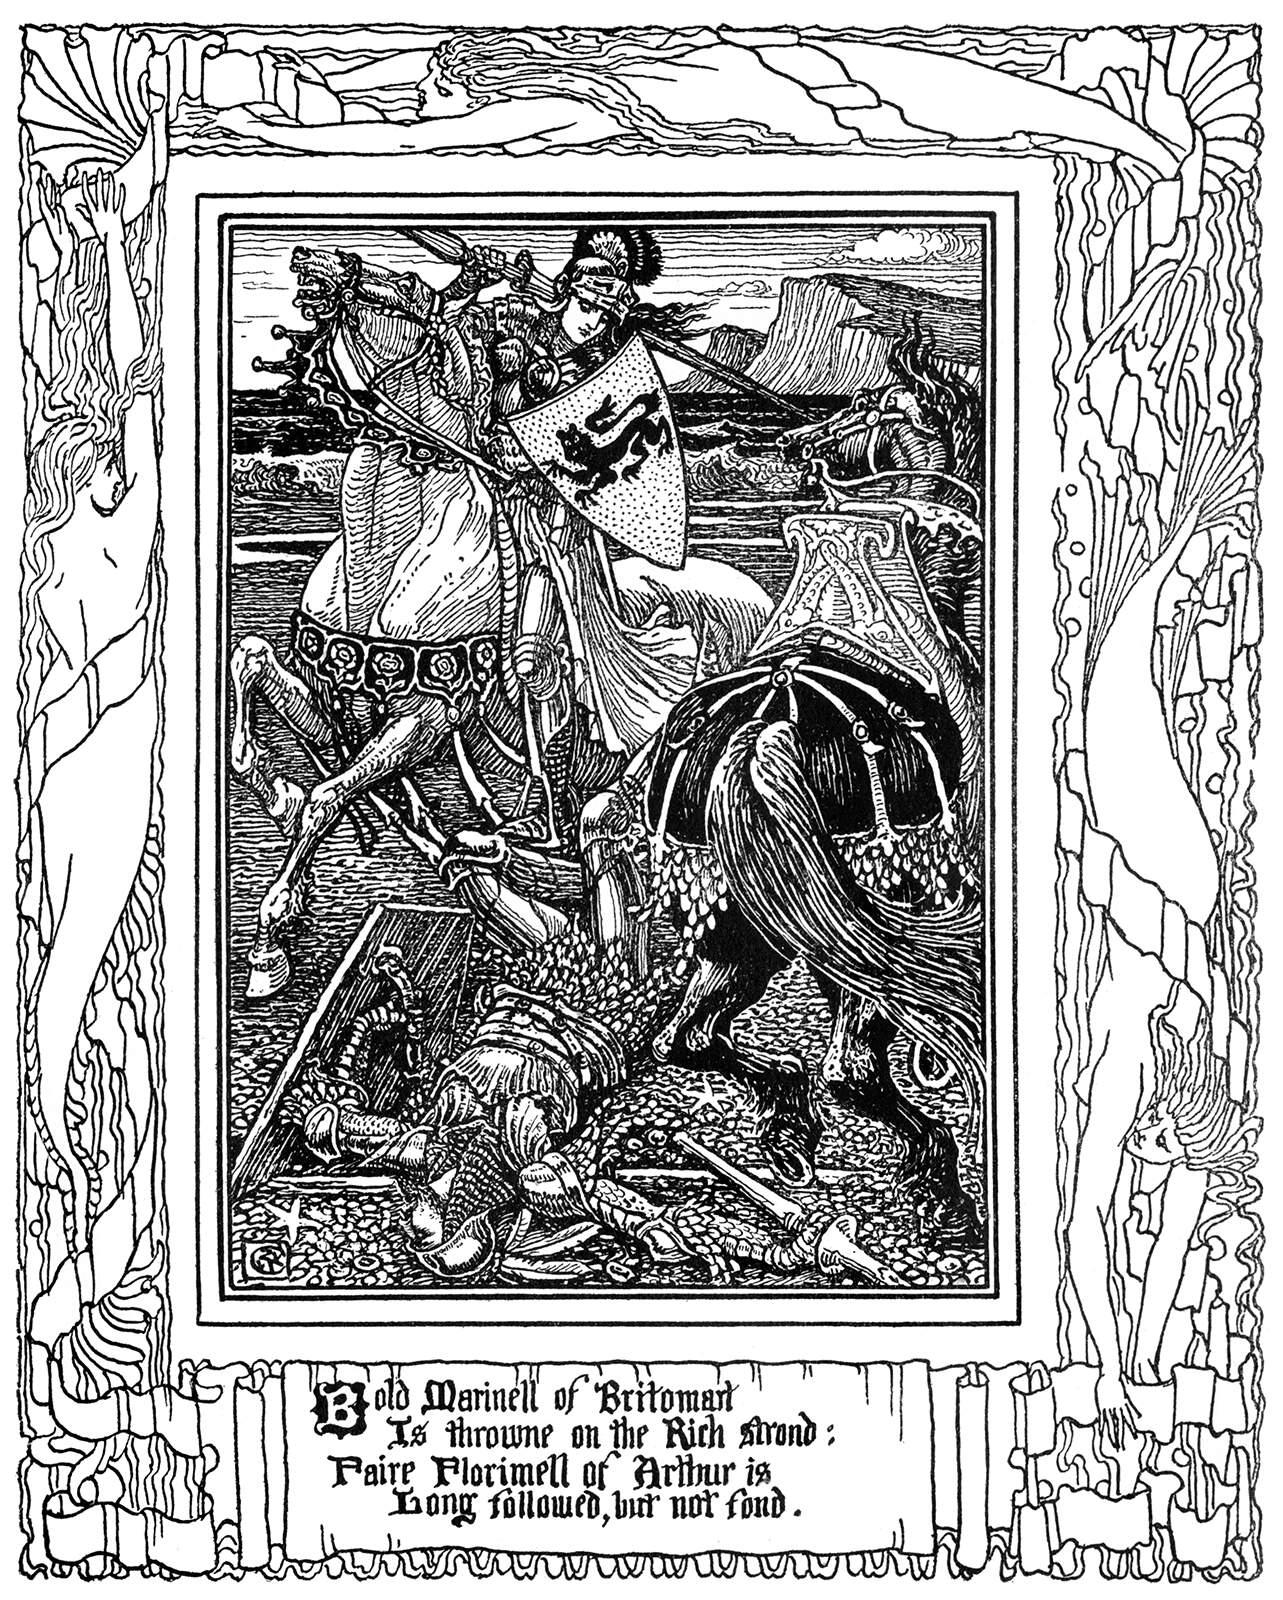 florimel-not-fond-1600.jpg (1283×1600)